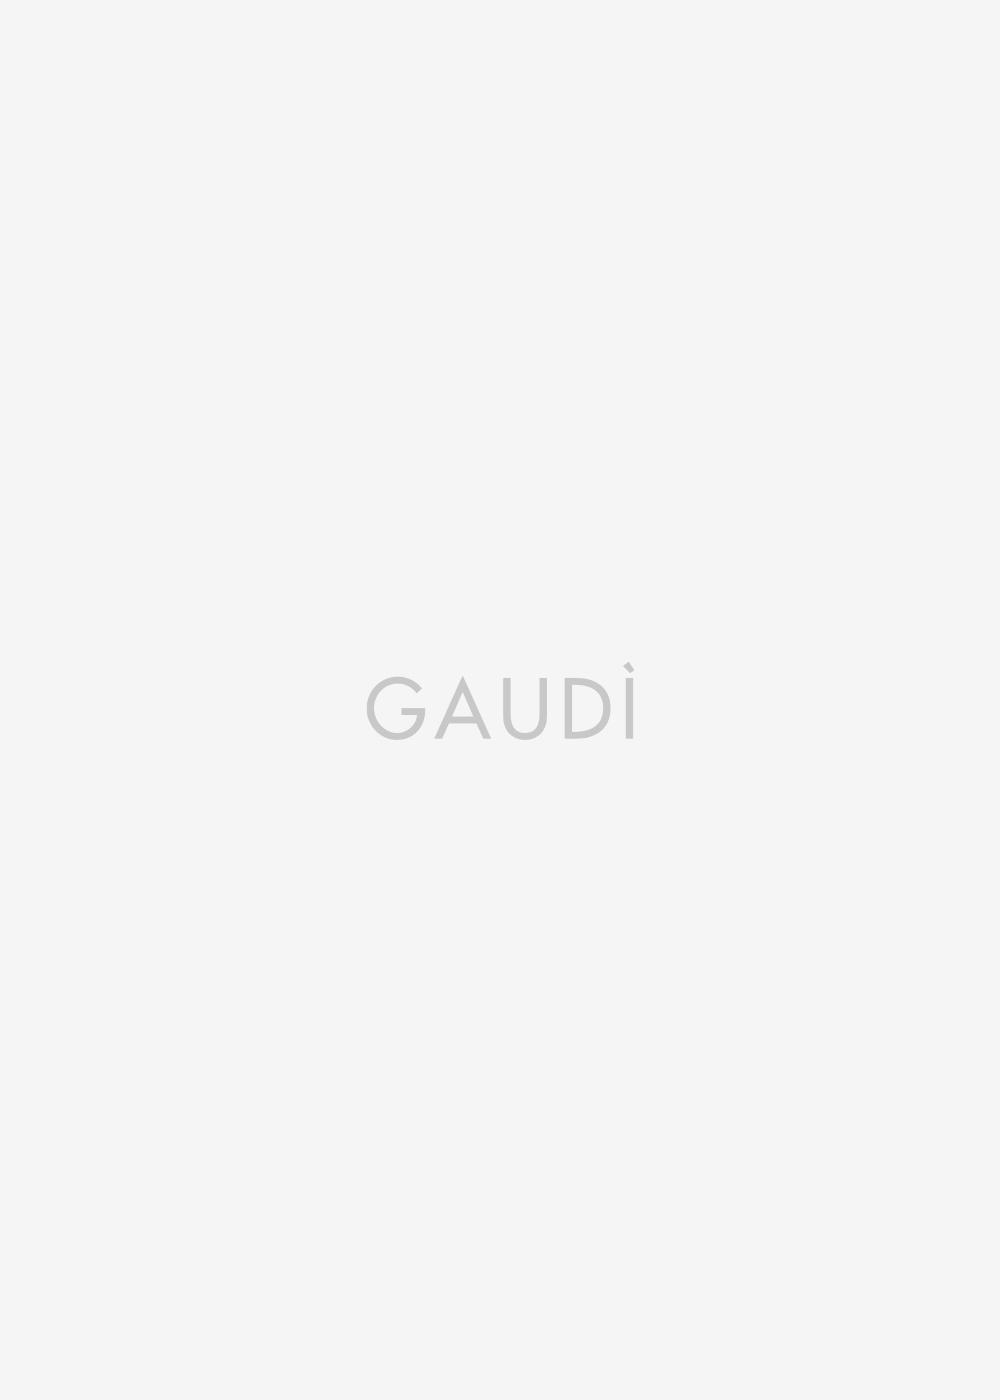 aa3229430326 Krepové capri nohavice s kvetovaným vzorom